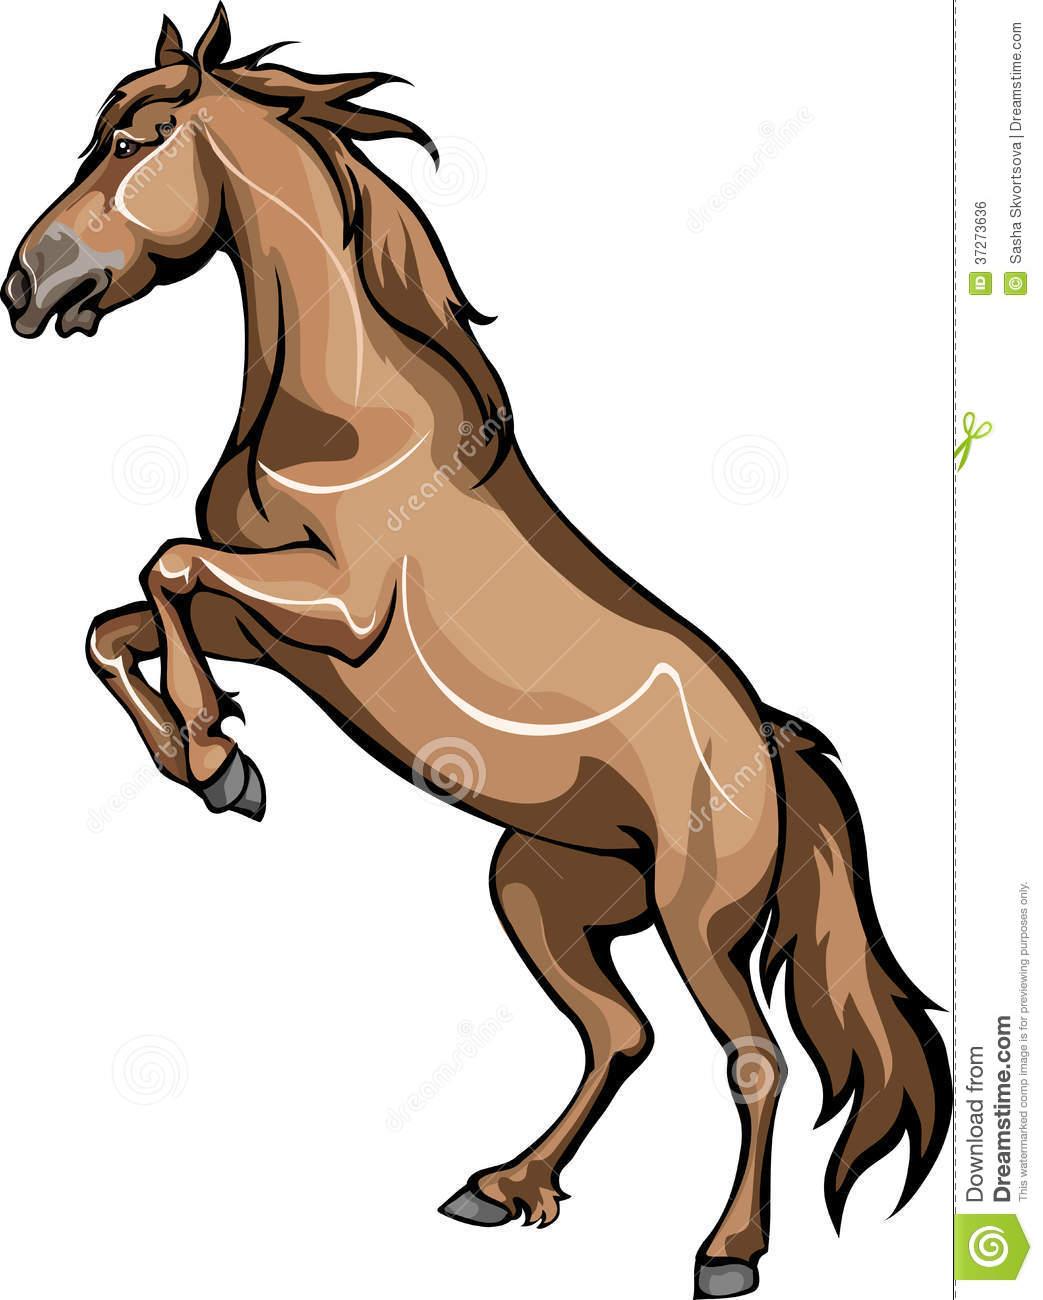 1043x1300 Legs Horse Clipart, Explore Pictures